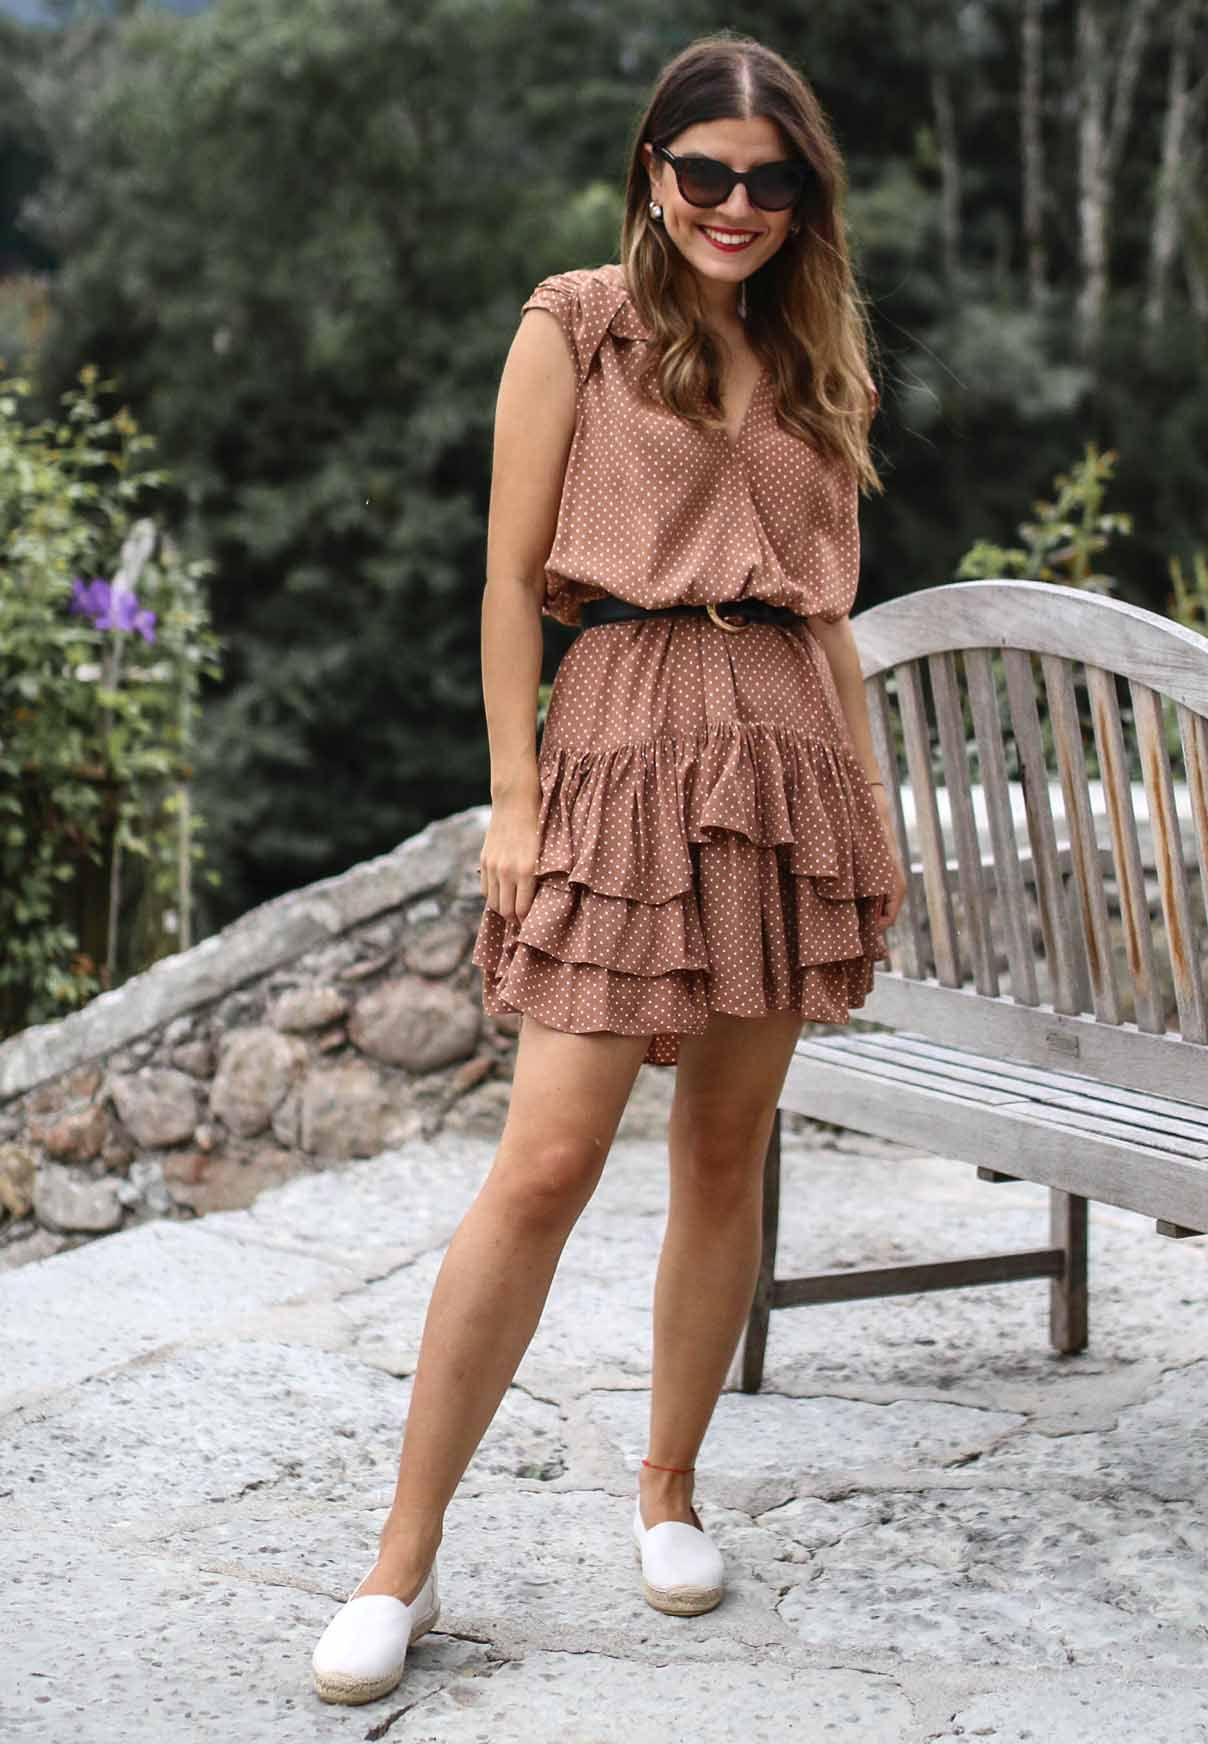 get the look - neslihan von @fashionnes_blog | urban apparel